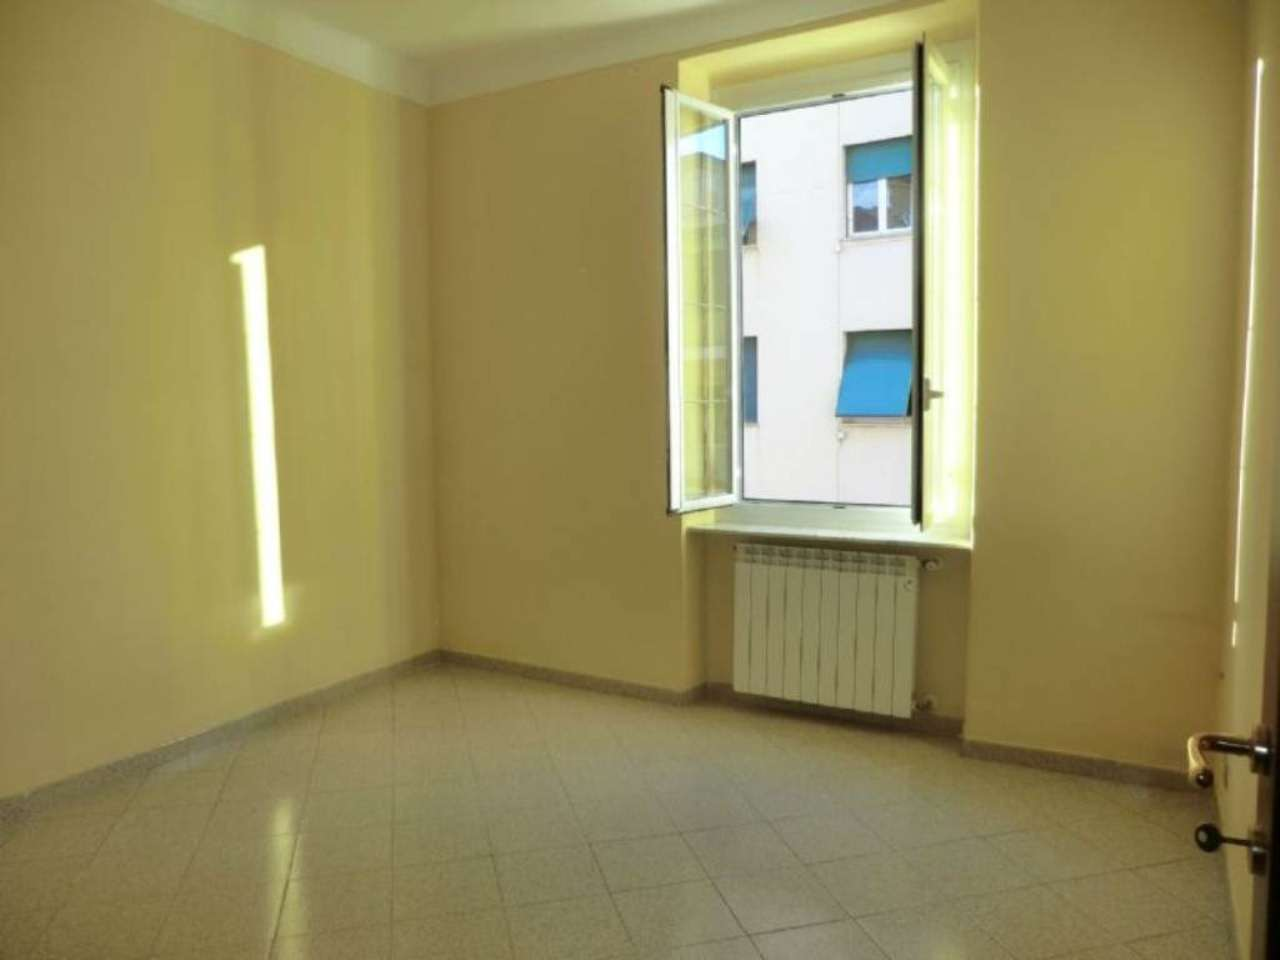 Bilocale Genova Via Ponza 3